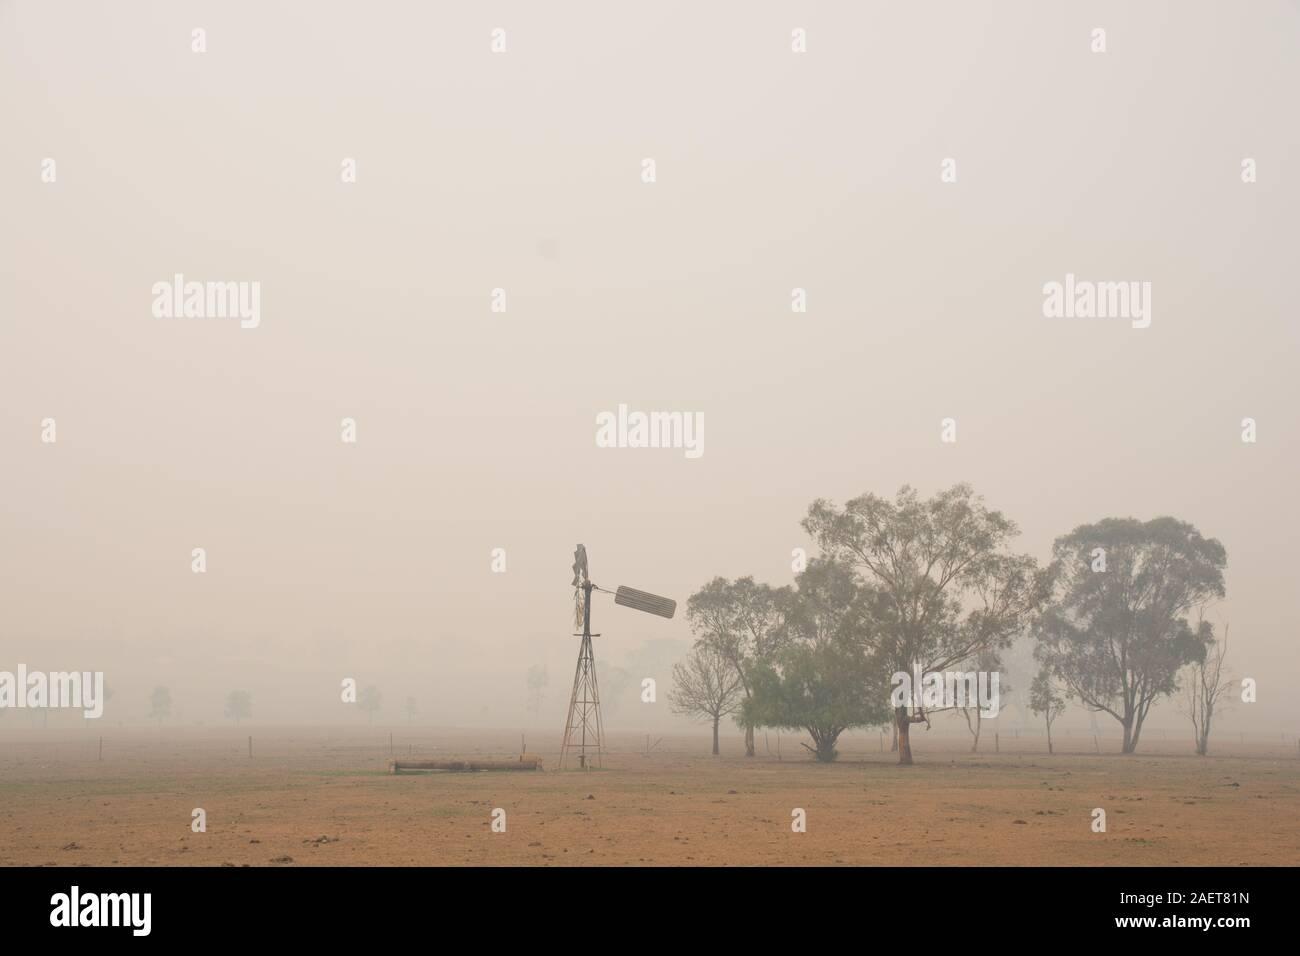 Heavy smoke pollution over a farm from bush fires 120km (70 miles) away.Tamworth Australia. Stock Photo